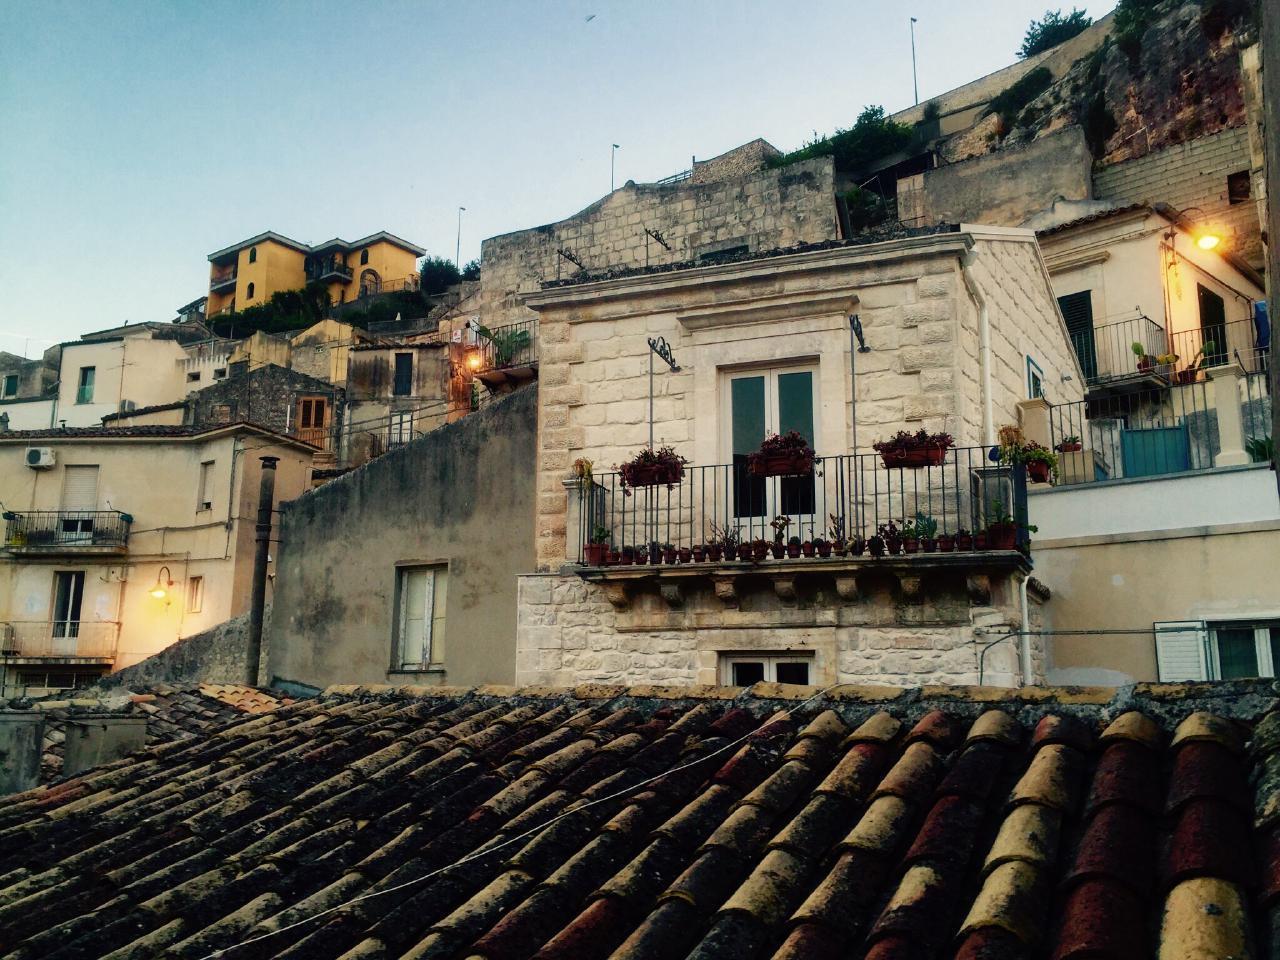 Maison de vacances Terrazza Barocca (1648450), Modica, Ragusa, Sicile, Italie, image 33